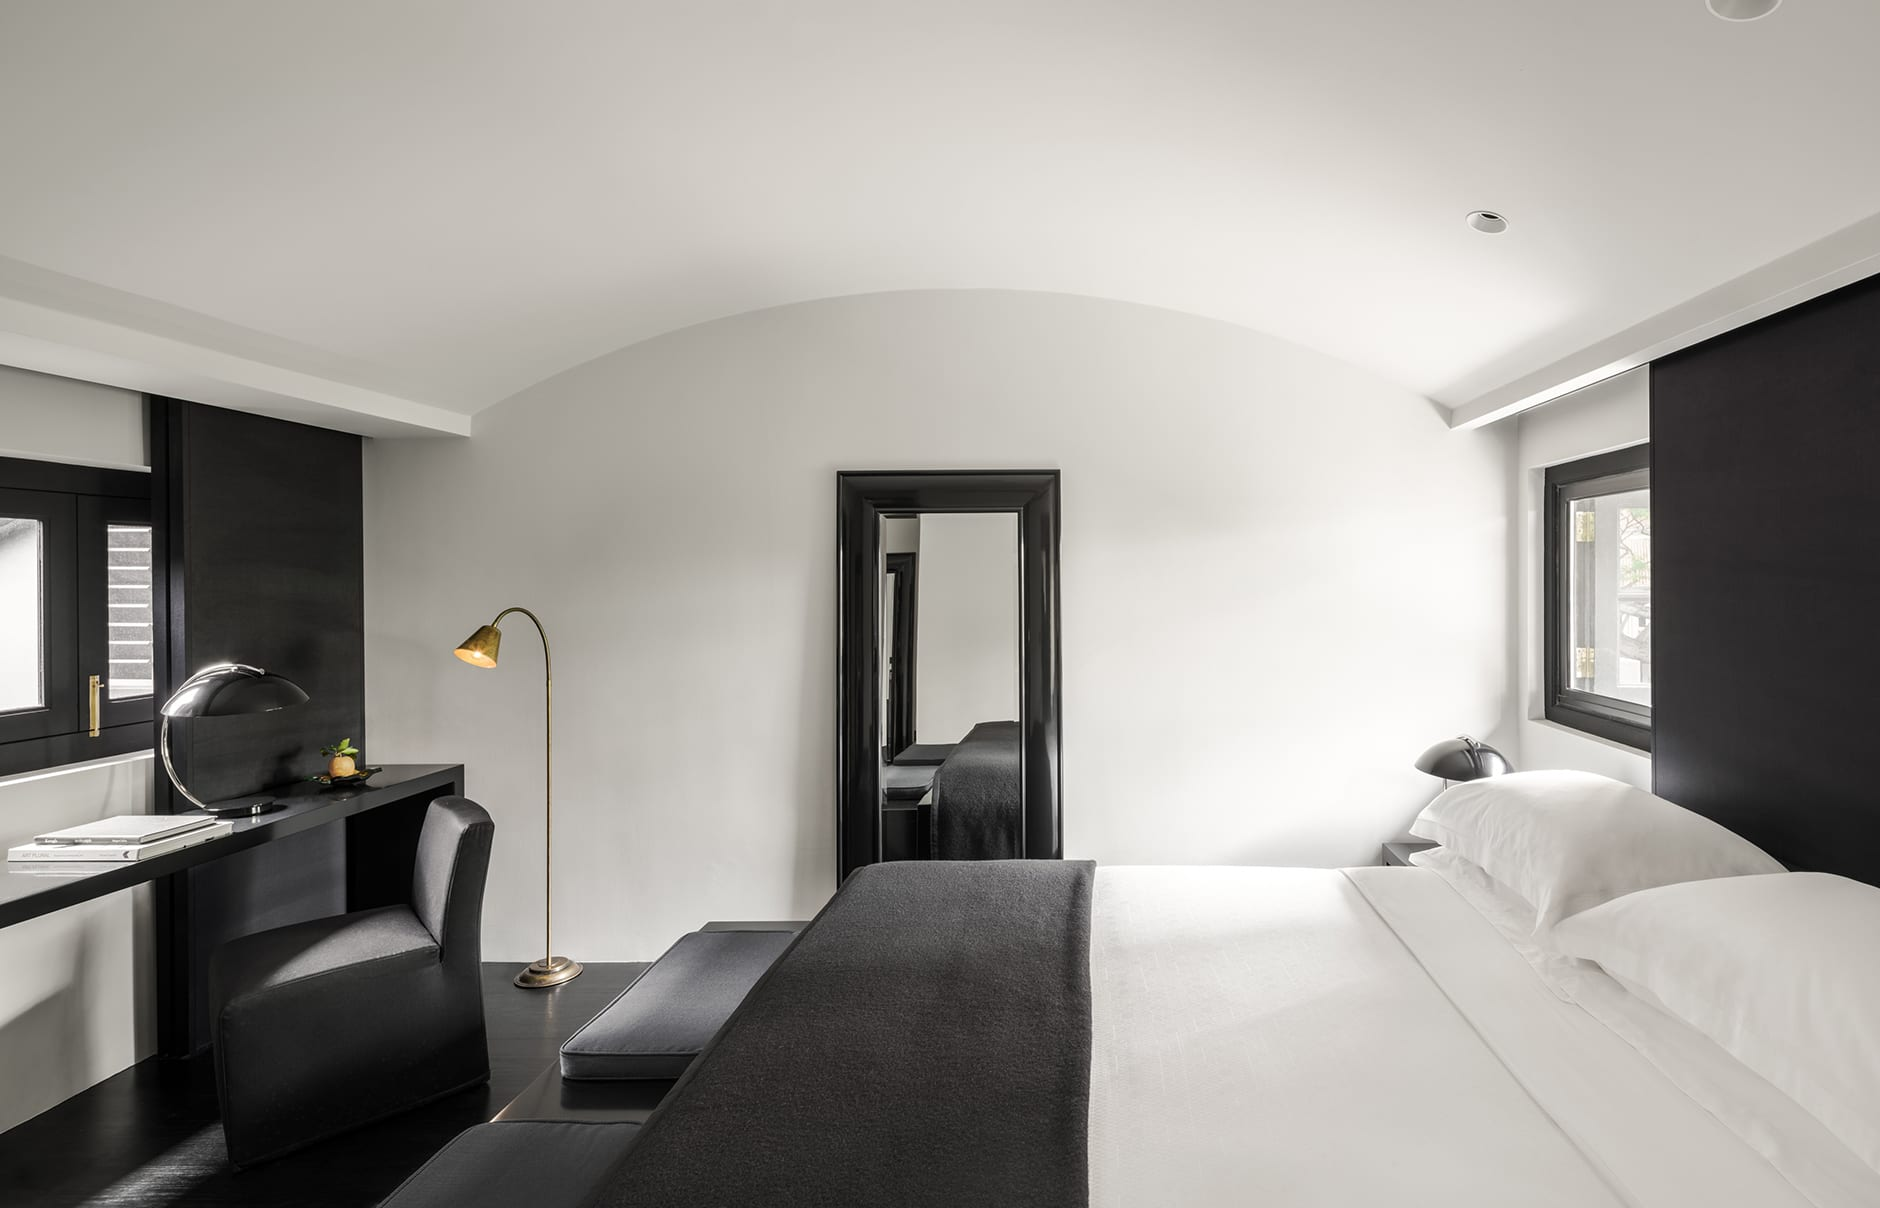 Six Senses Duxton, Singapore. Shophouse Room. Luxury Hotel Review by TravelPlusStyle. Photo © Six Senses Hotels Resorts Spas